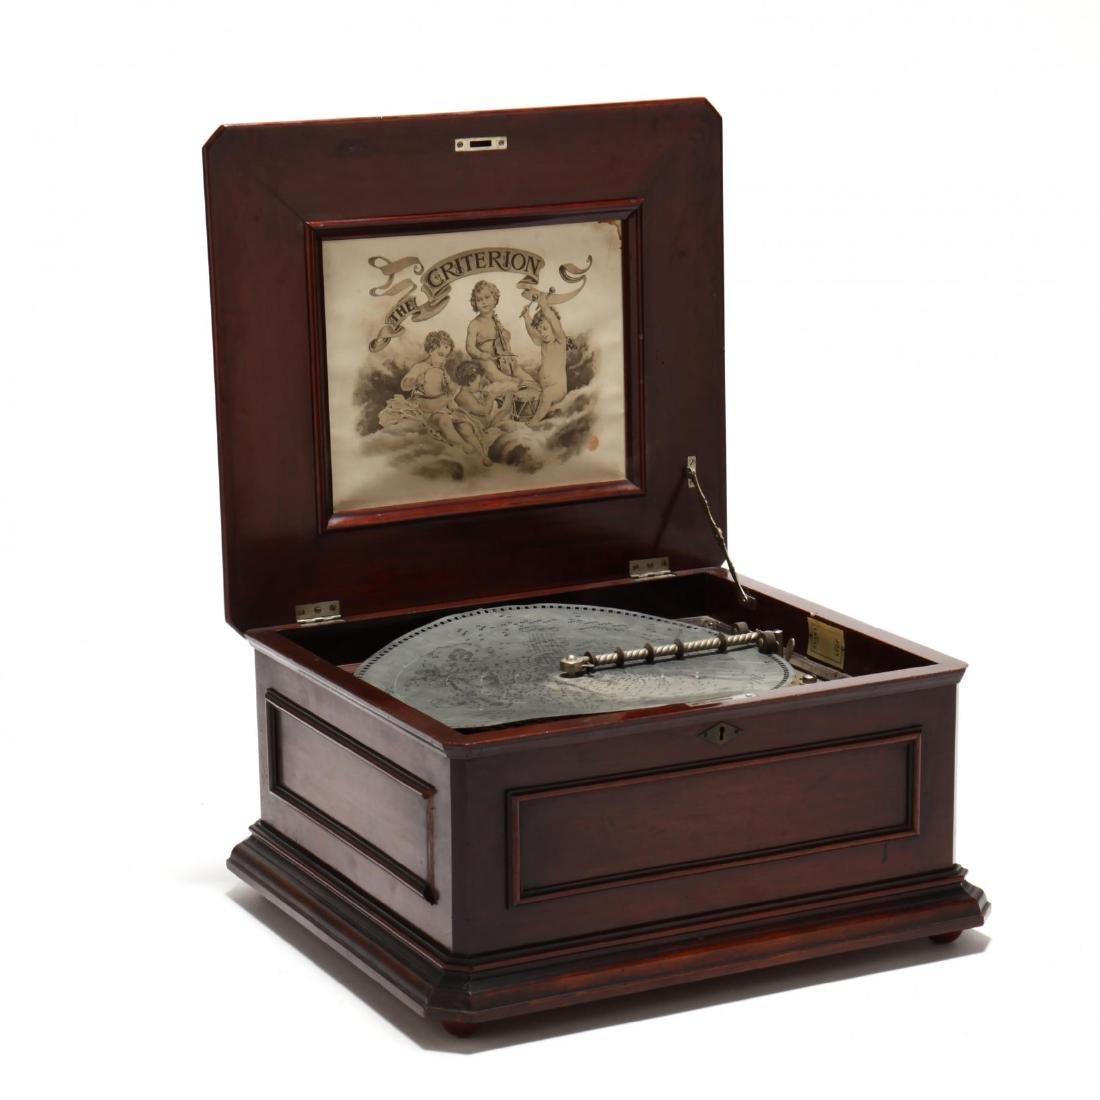 Criterion Double Comb Music Box